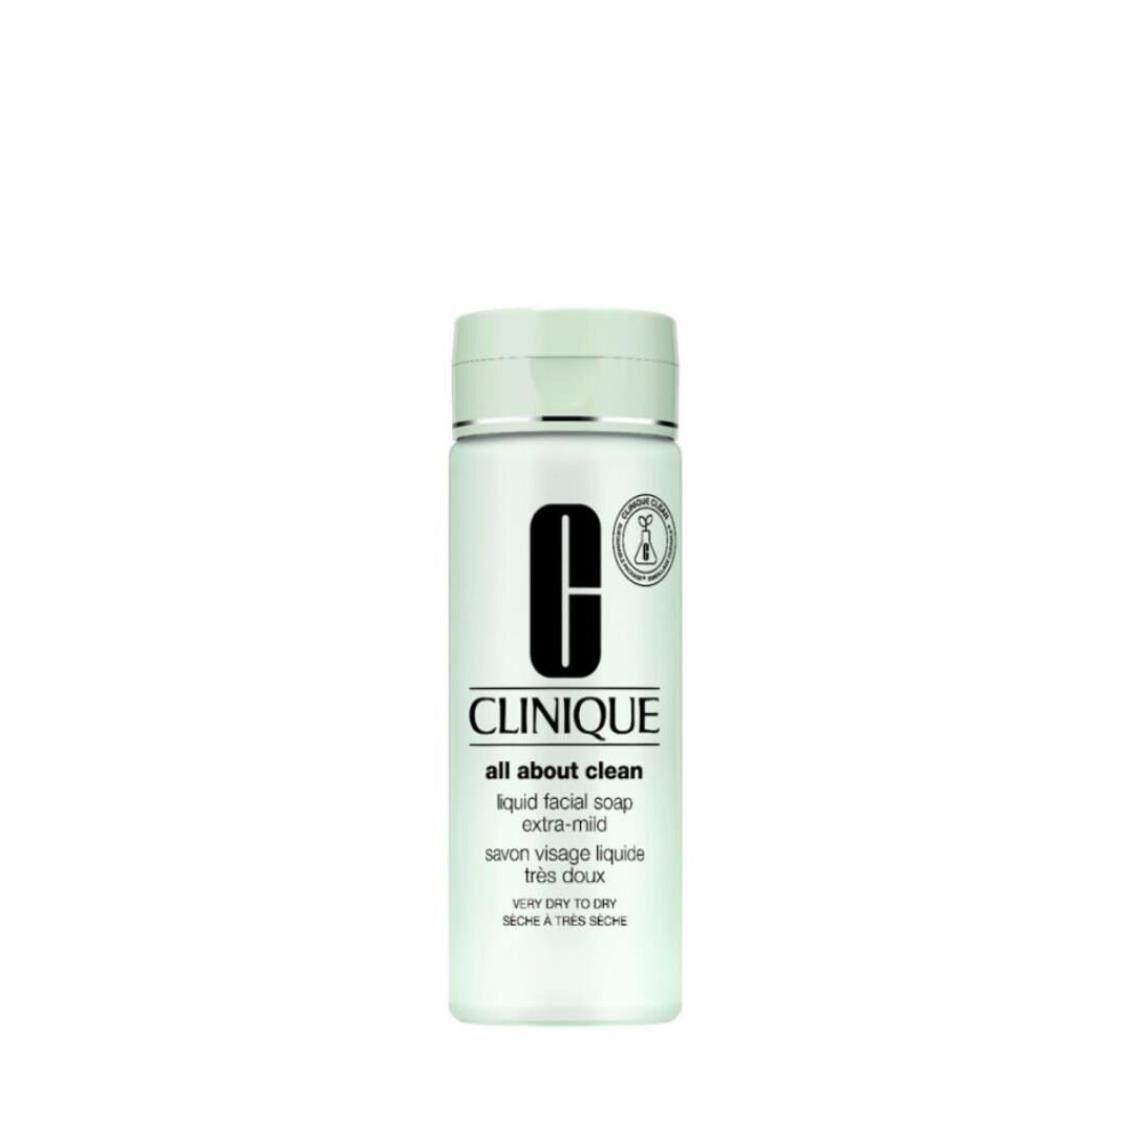 Clinique All About Clean Liquid Facial Soap Extra Mild 200ml